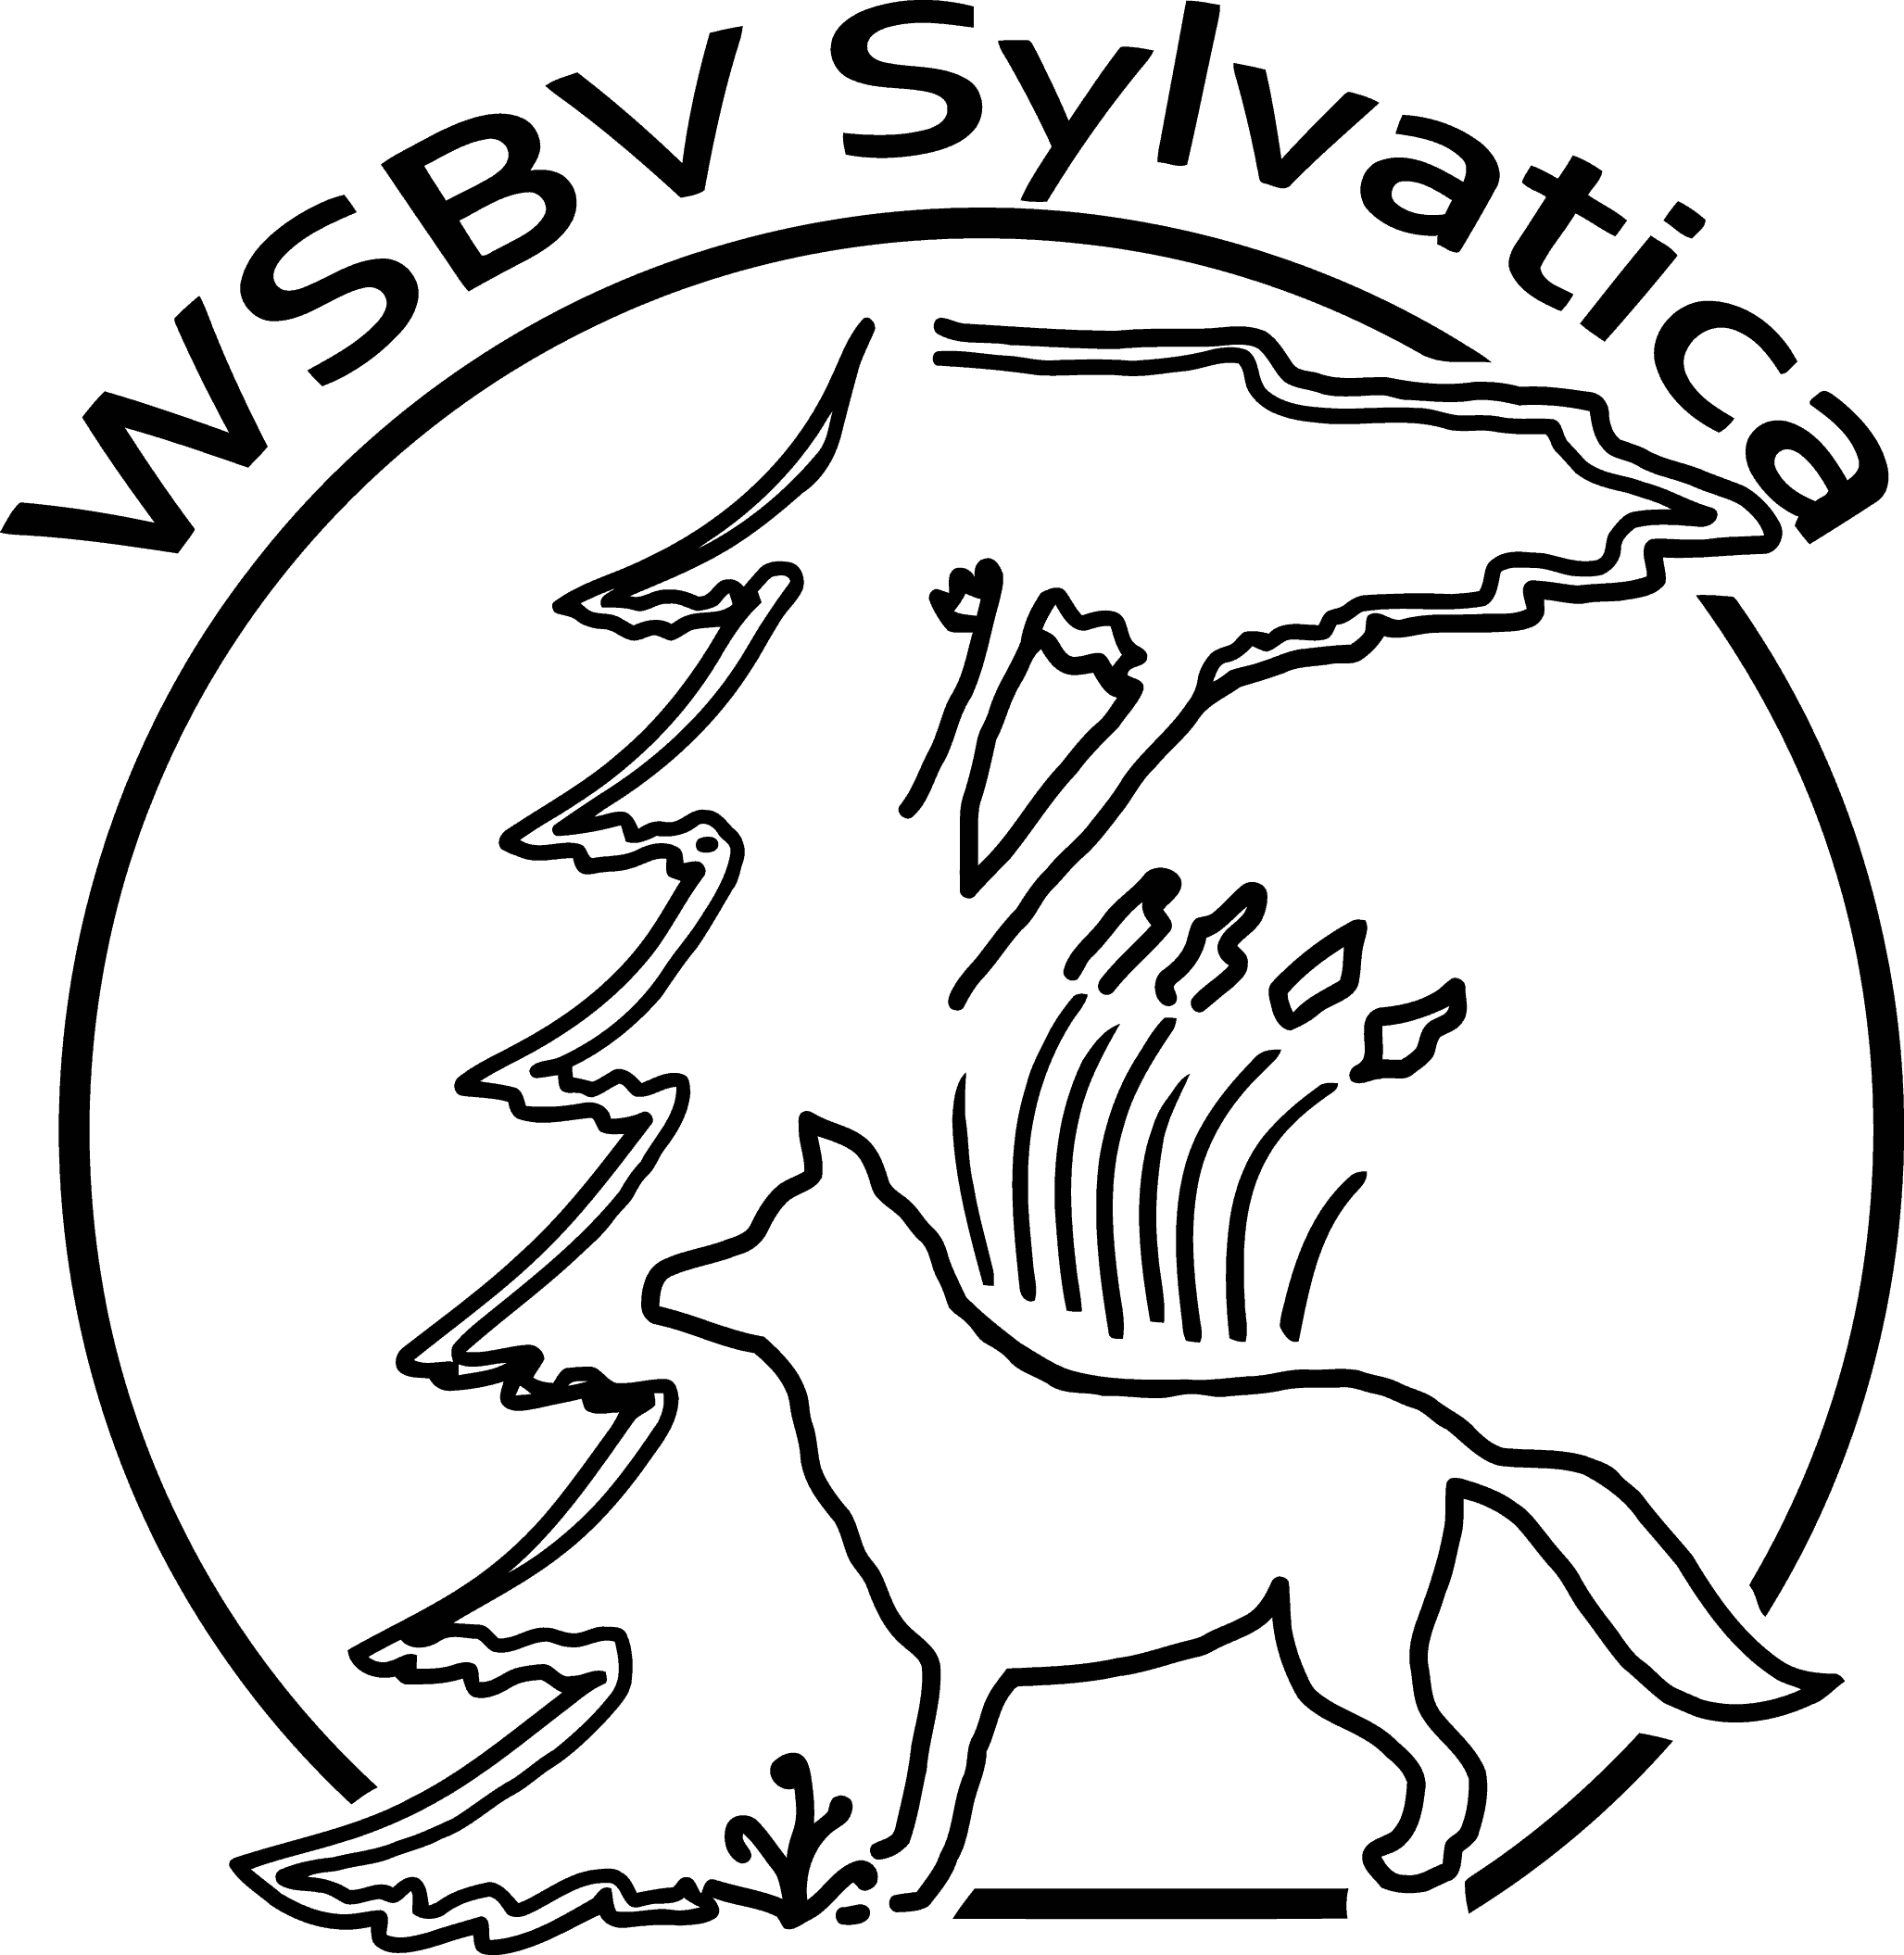 WSBV Sylvatica